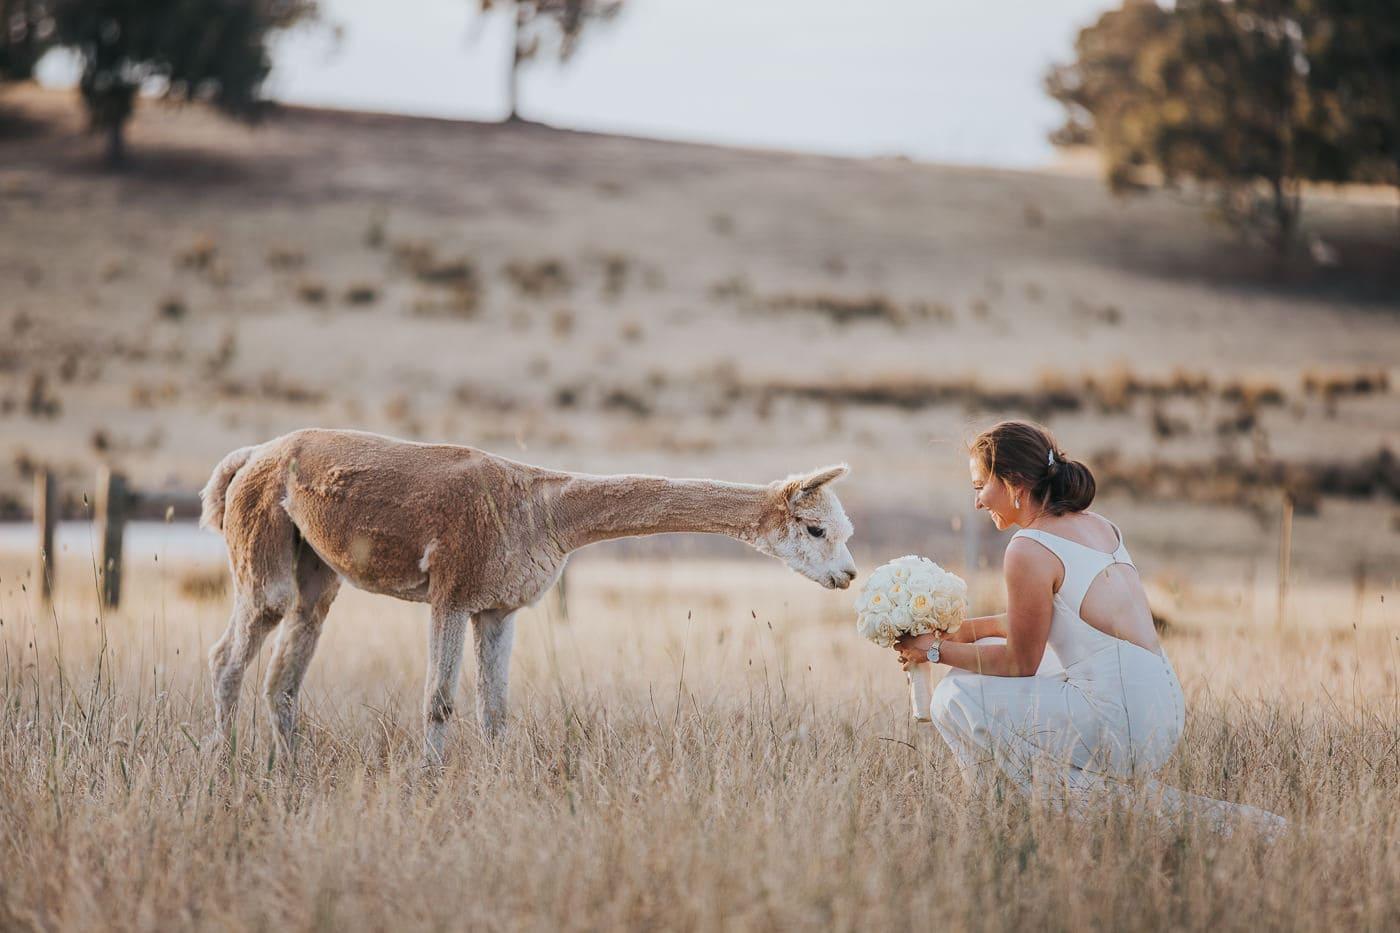 Wedding Photos creative and unposed - wedding photos in Melbourne with animals - Llama / Alpaca Wedding Photos